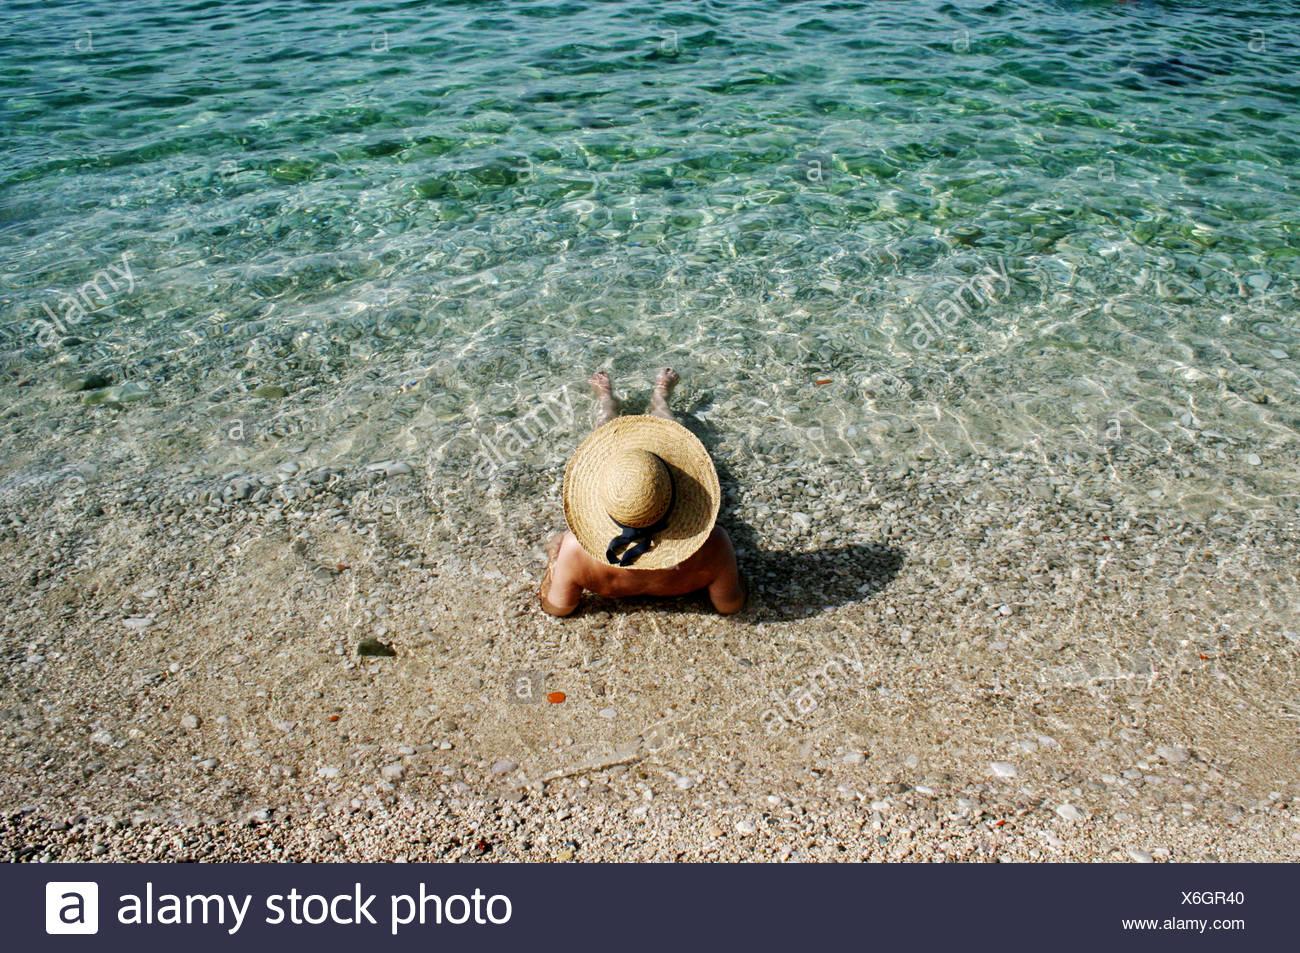 Croatia, Woman with straw hat sunbathing - Stock Image